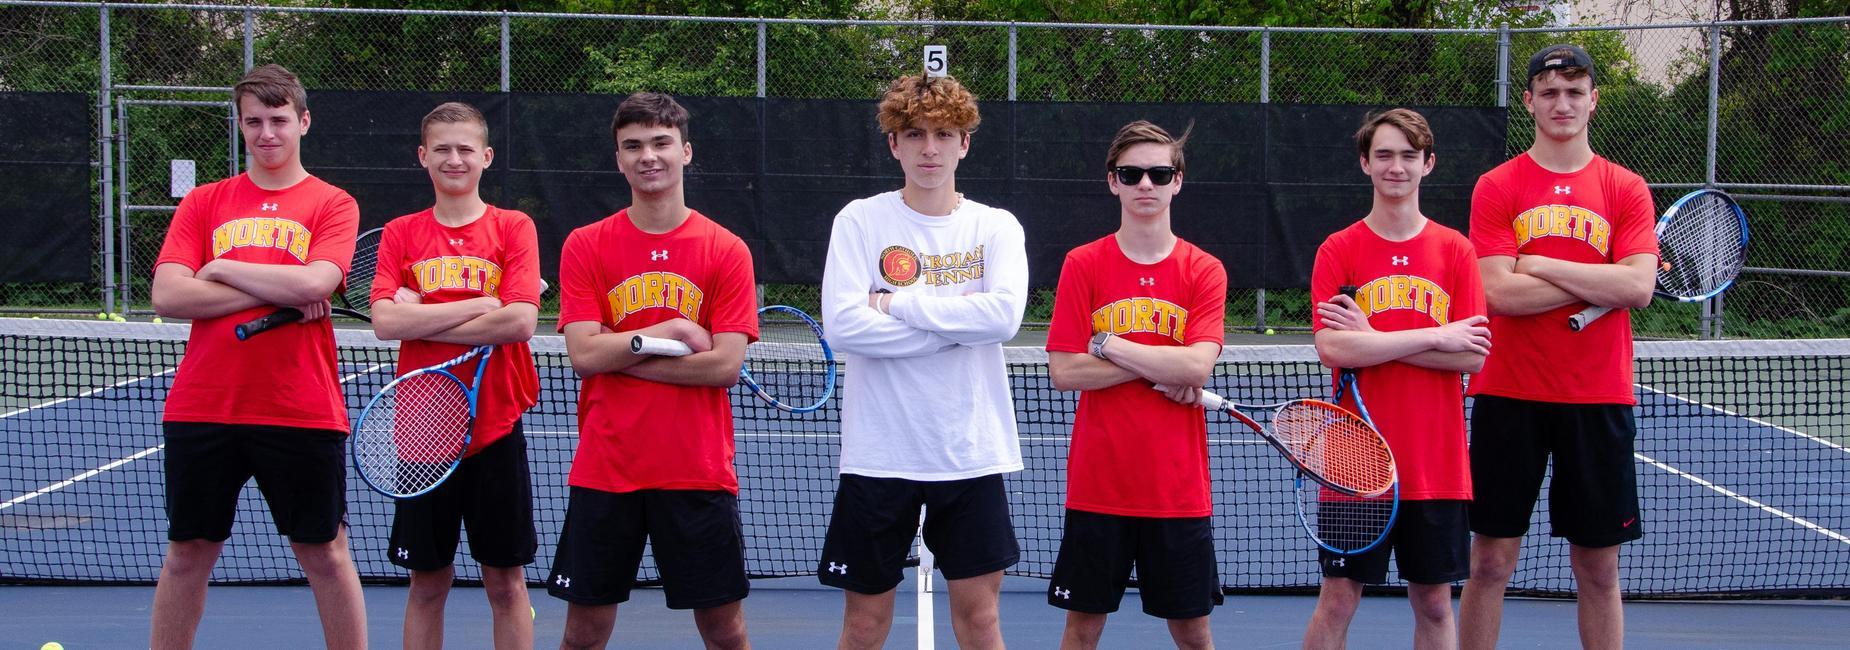 North Catholic Boys Tennis